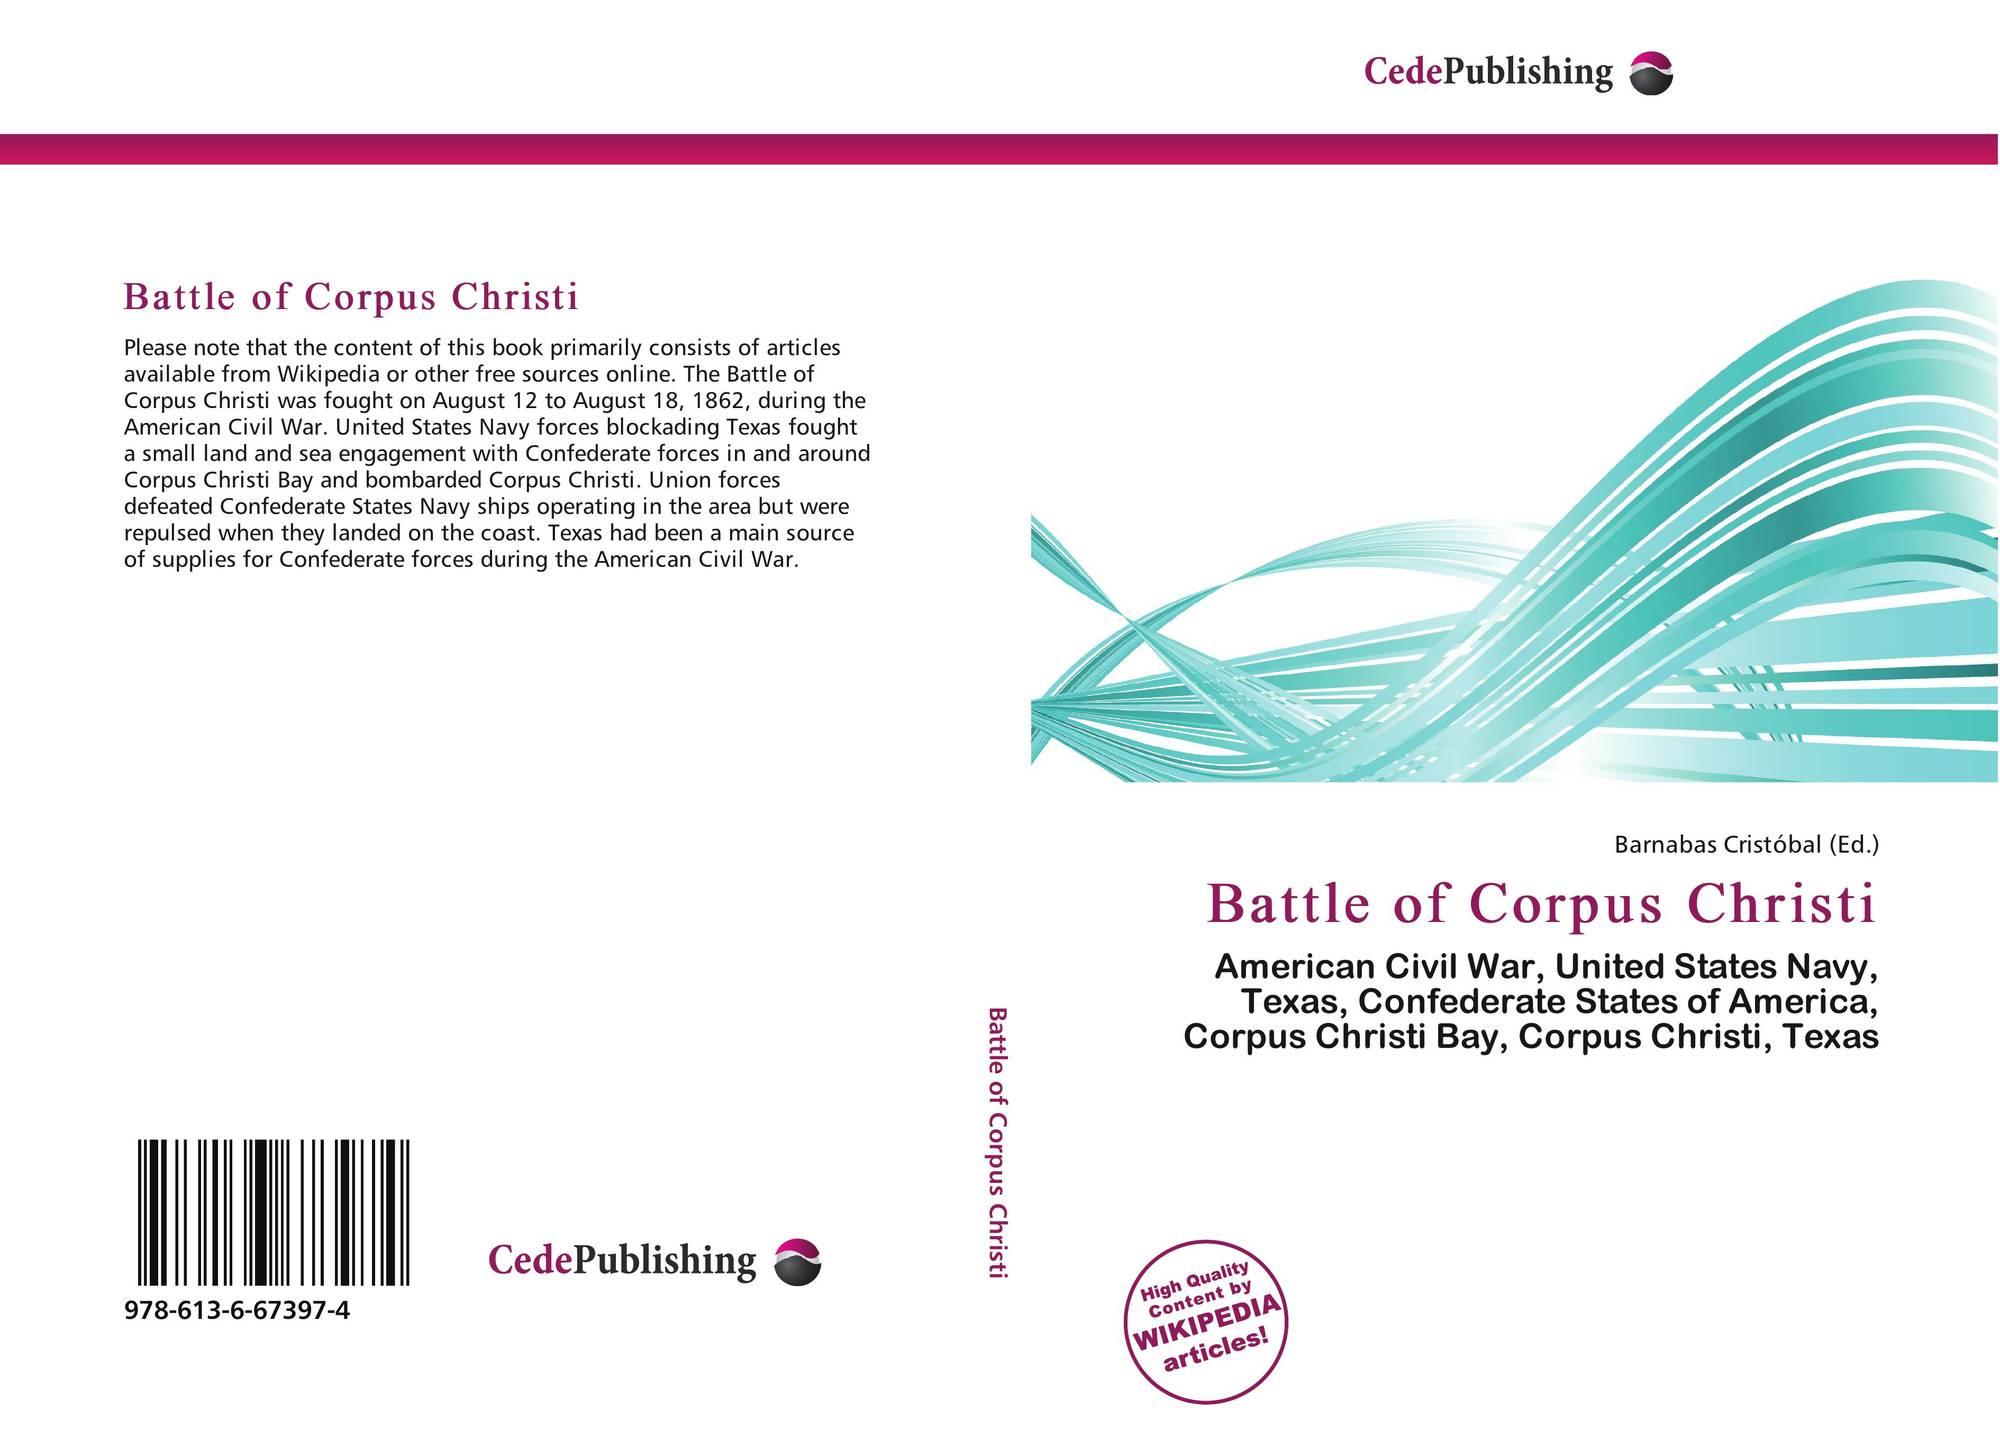 katholische Diözese von Corpus Christi